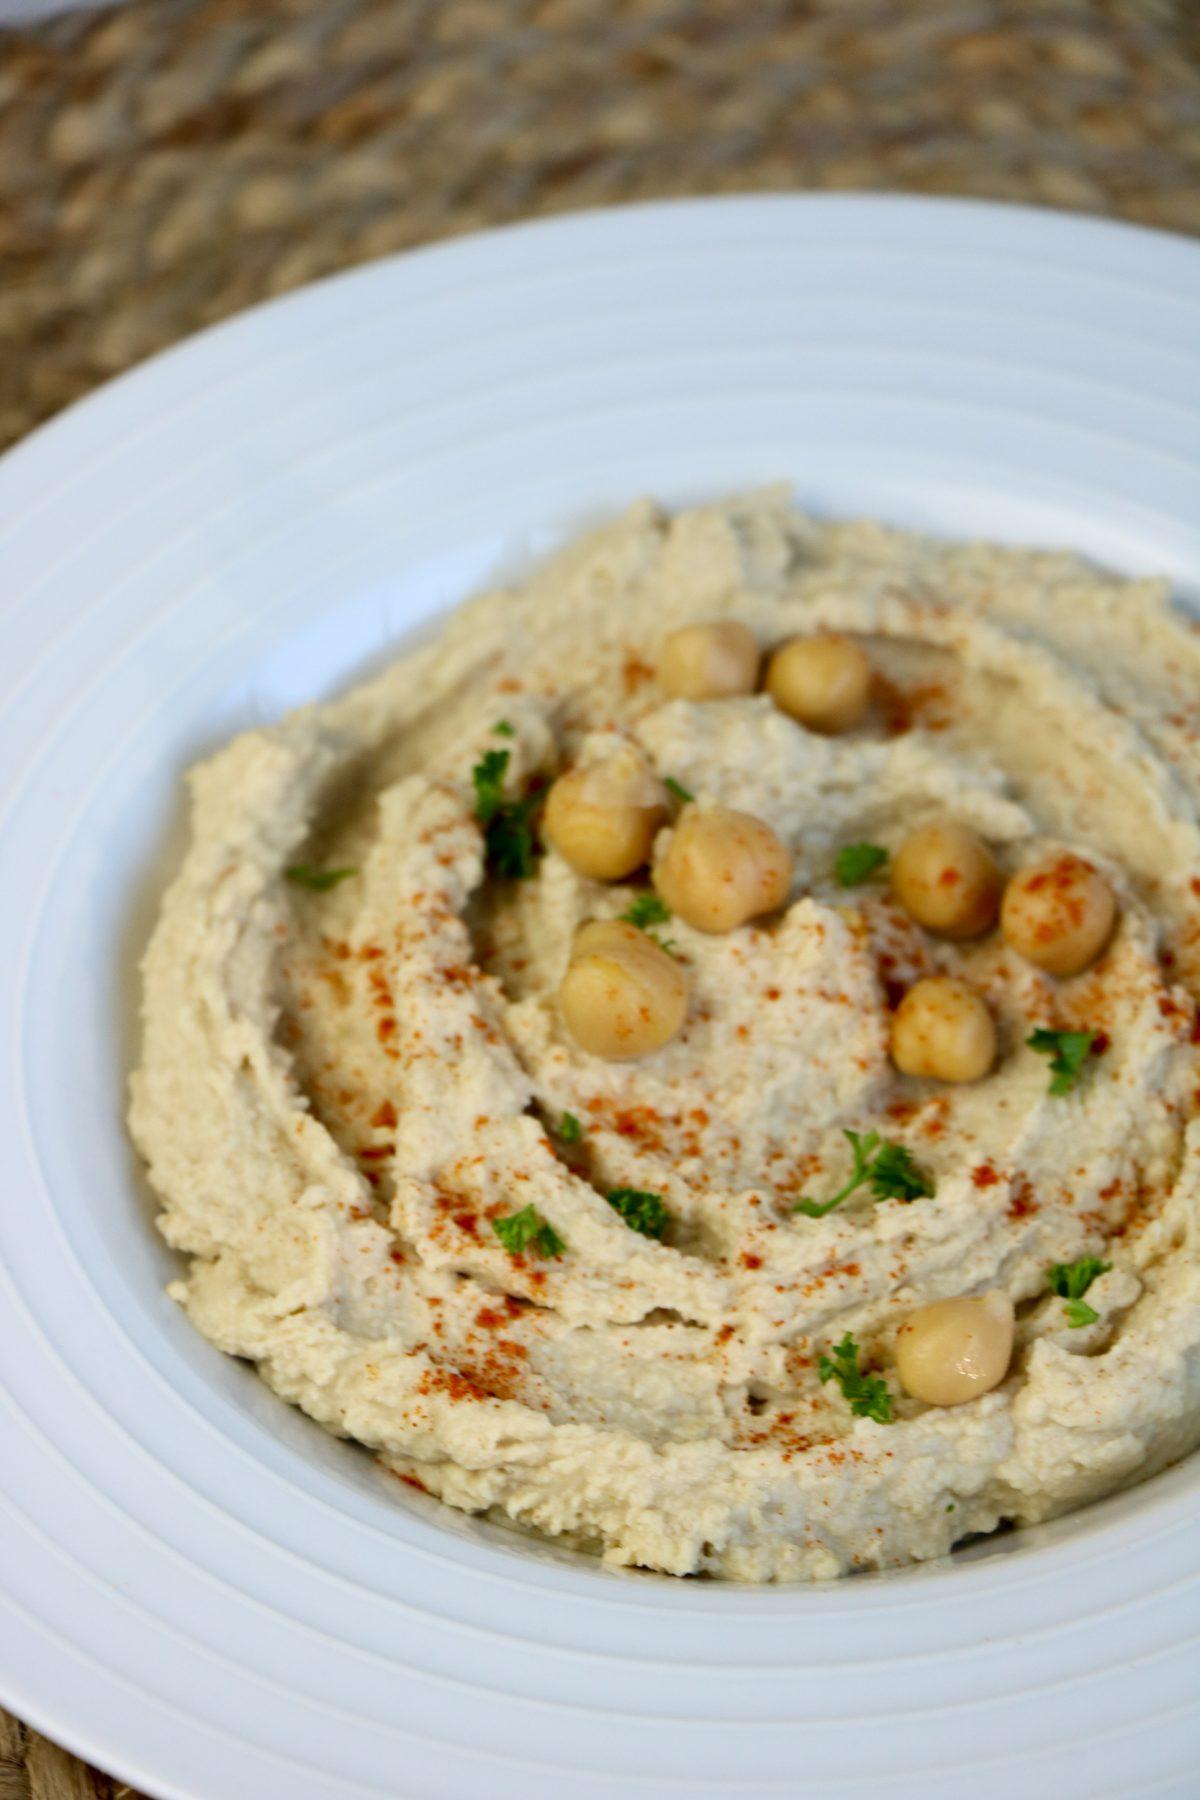 instant pot hummus in a bowl